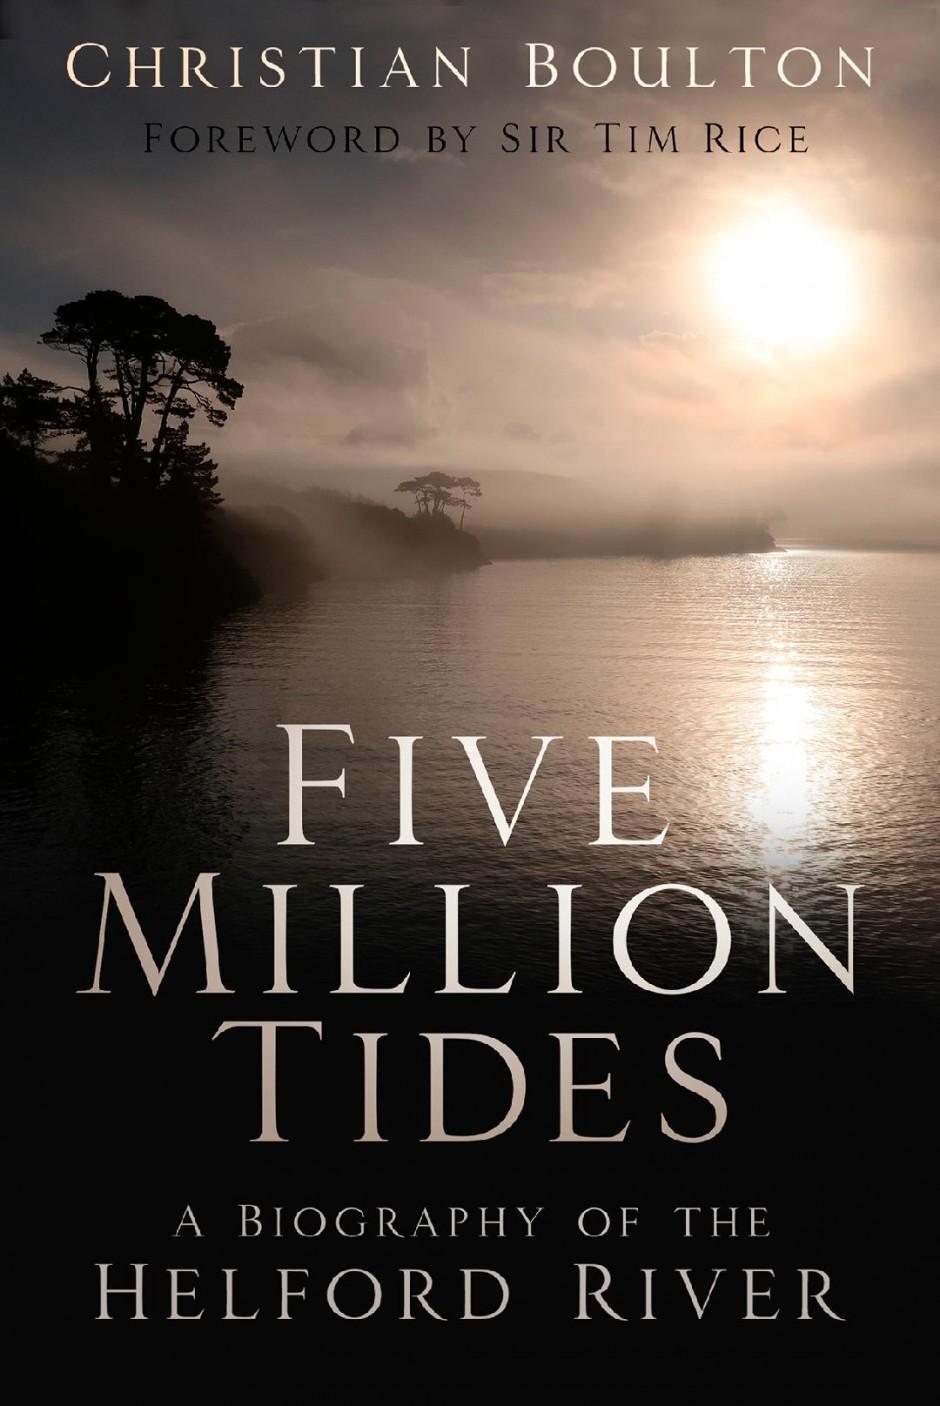 Five Million Tides book cover